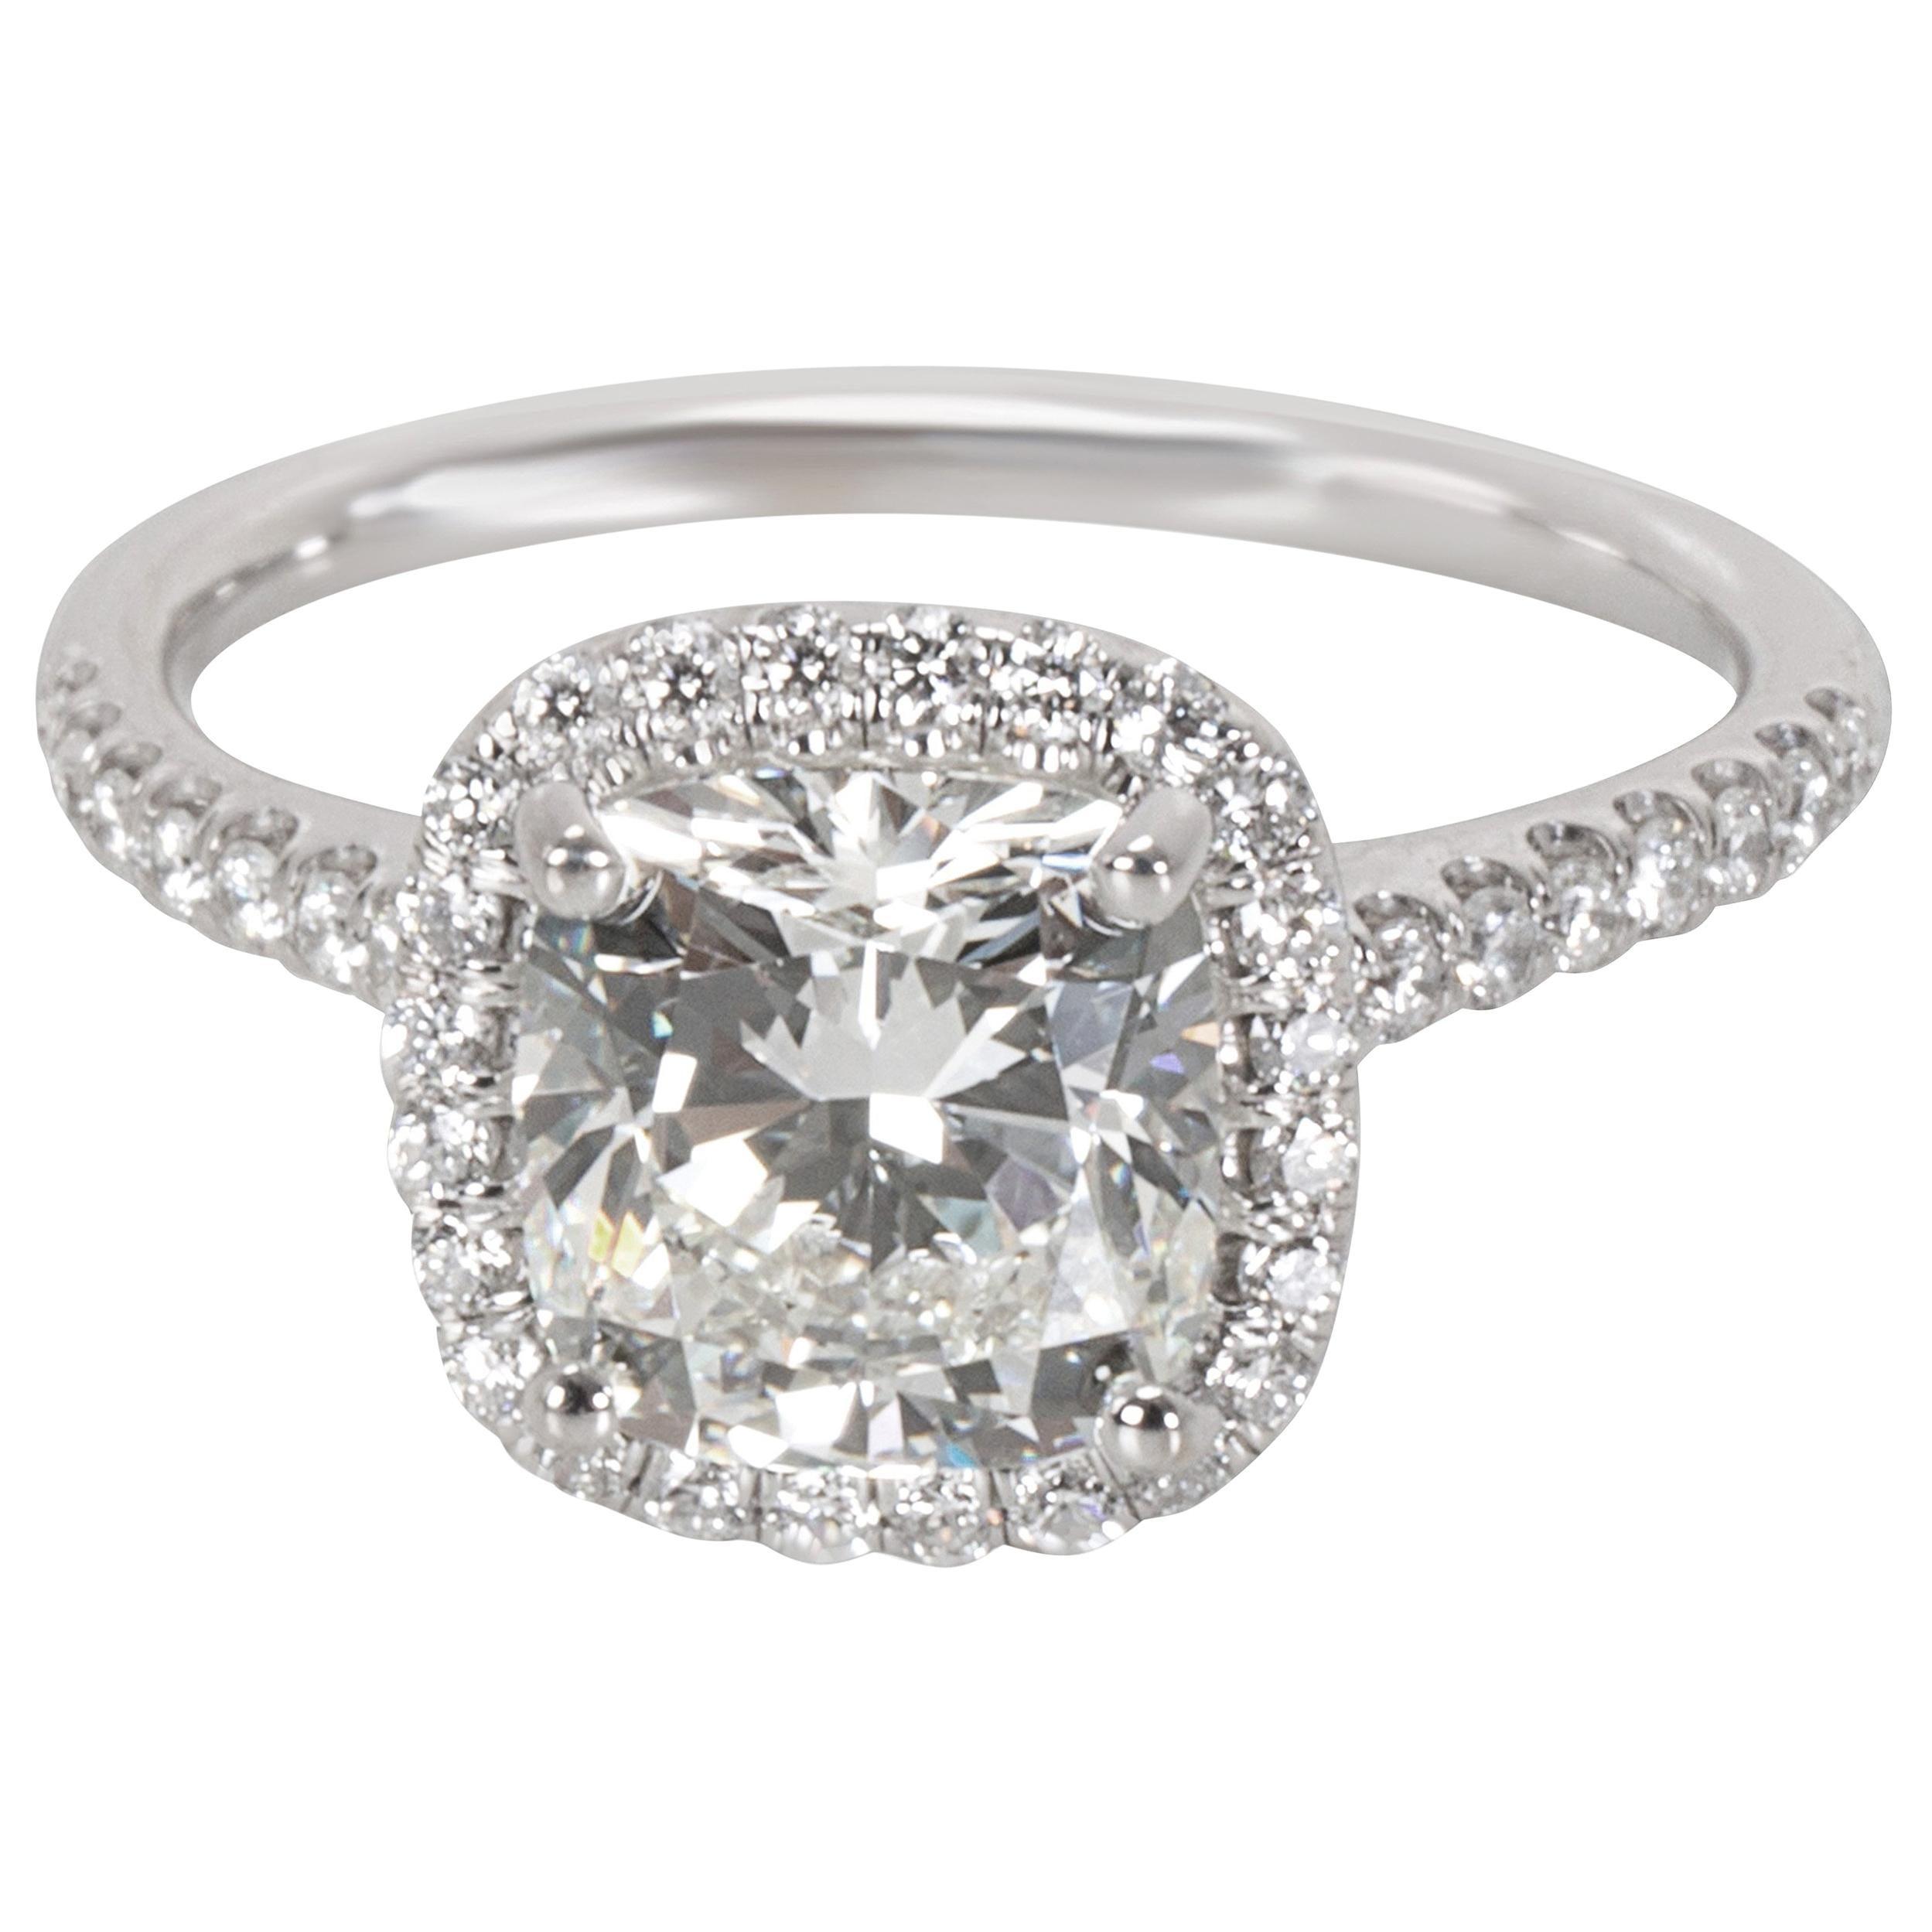 836d86b2ba0d2 James Allen Cushion Cut Halo Diamond Ring in 14 Karat Gold J SI1 1.90 Carat